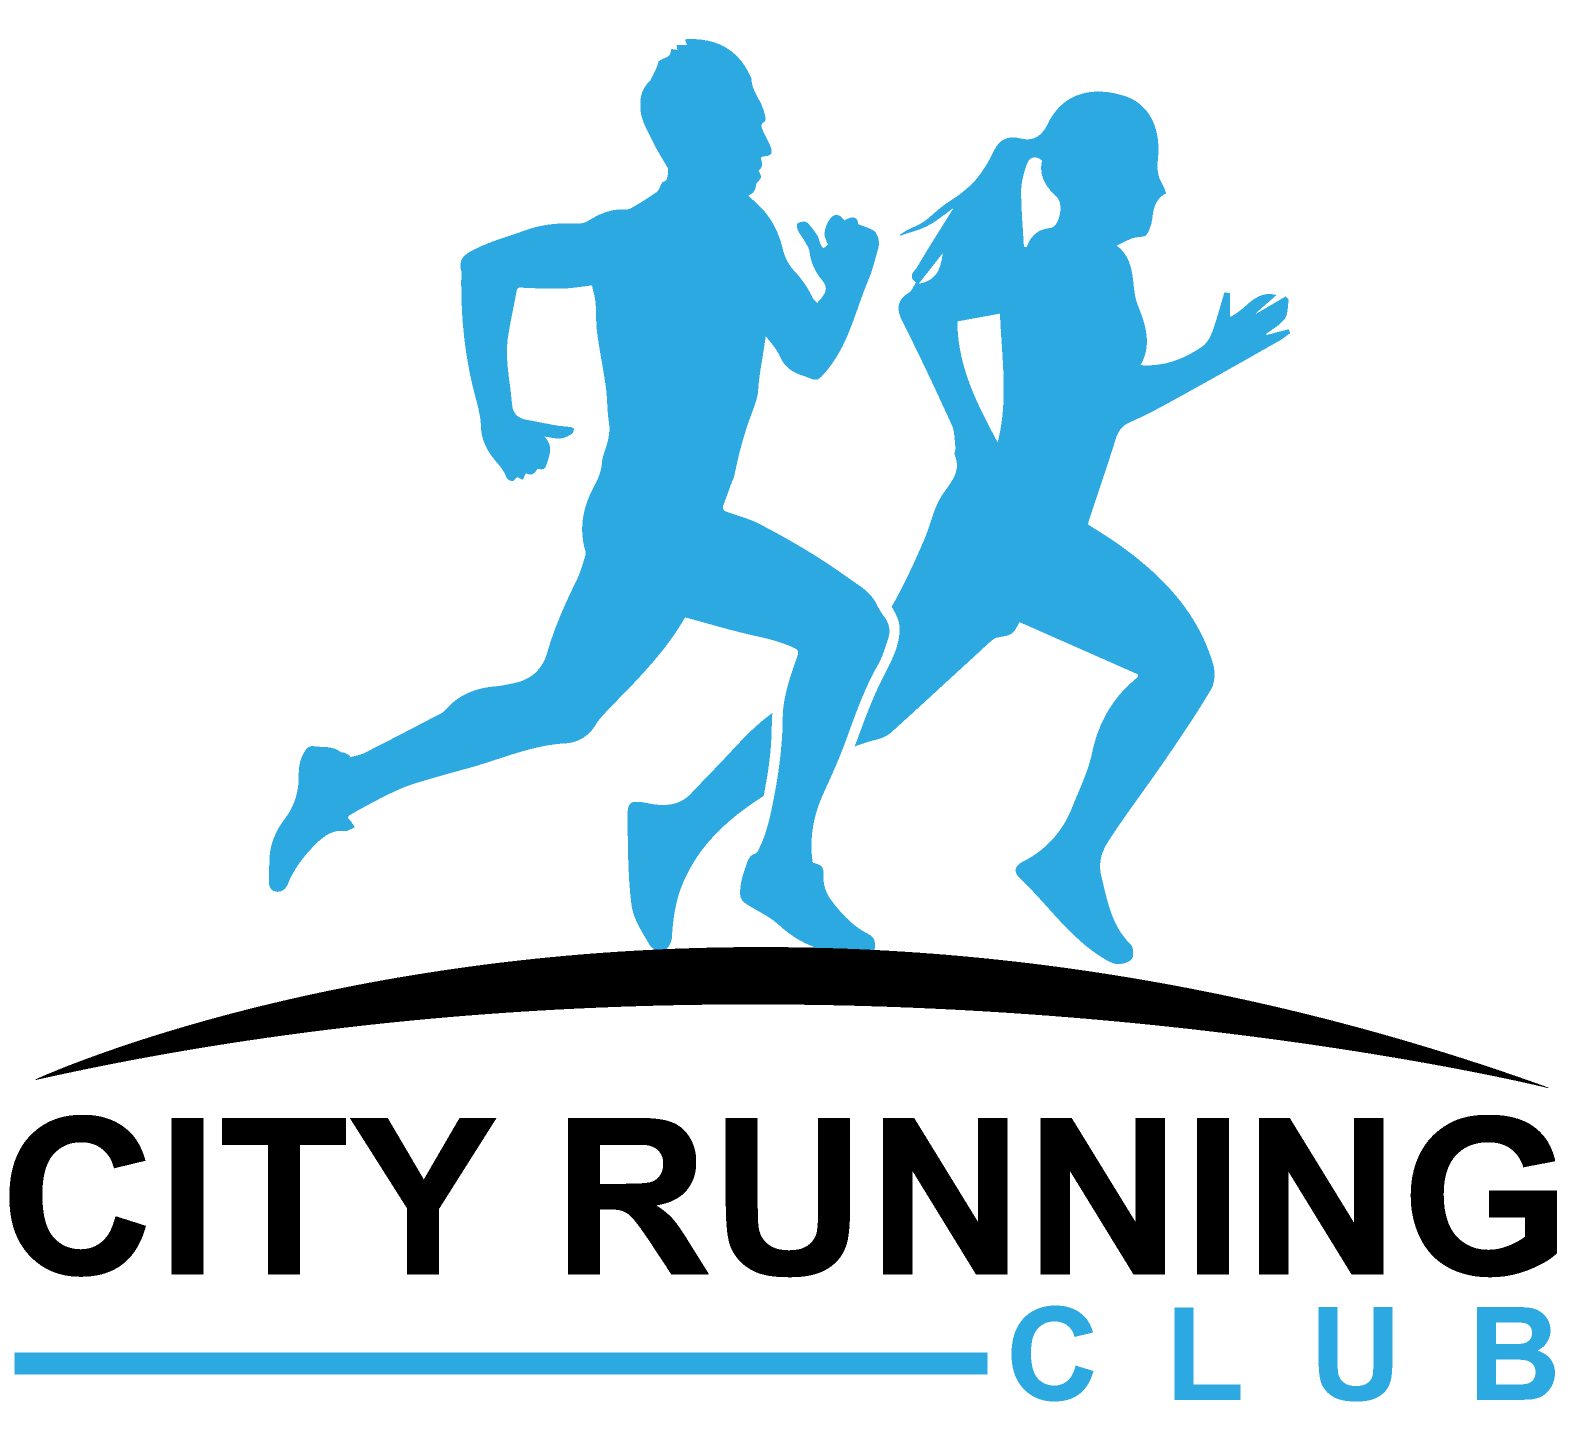 cityrunningclub-14png